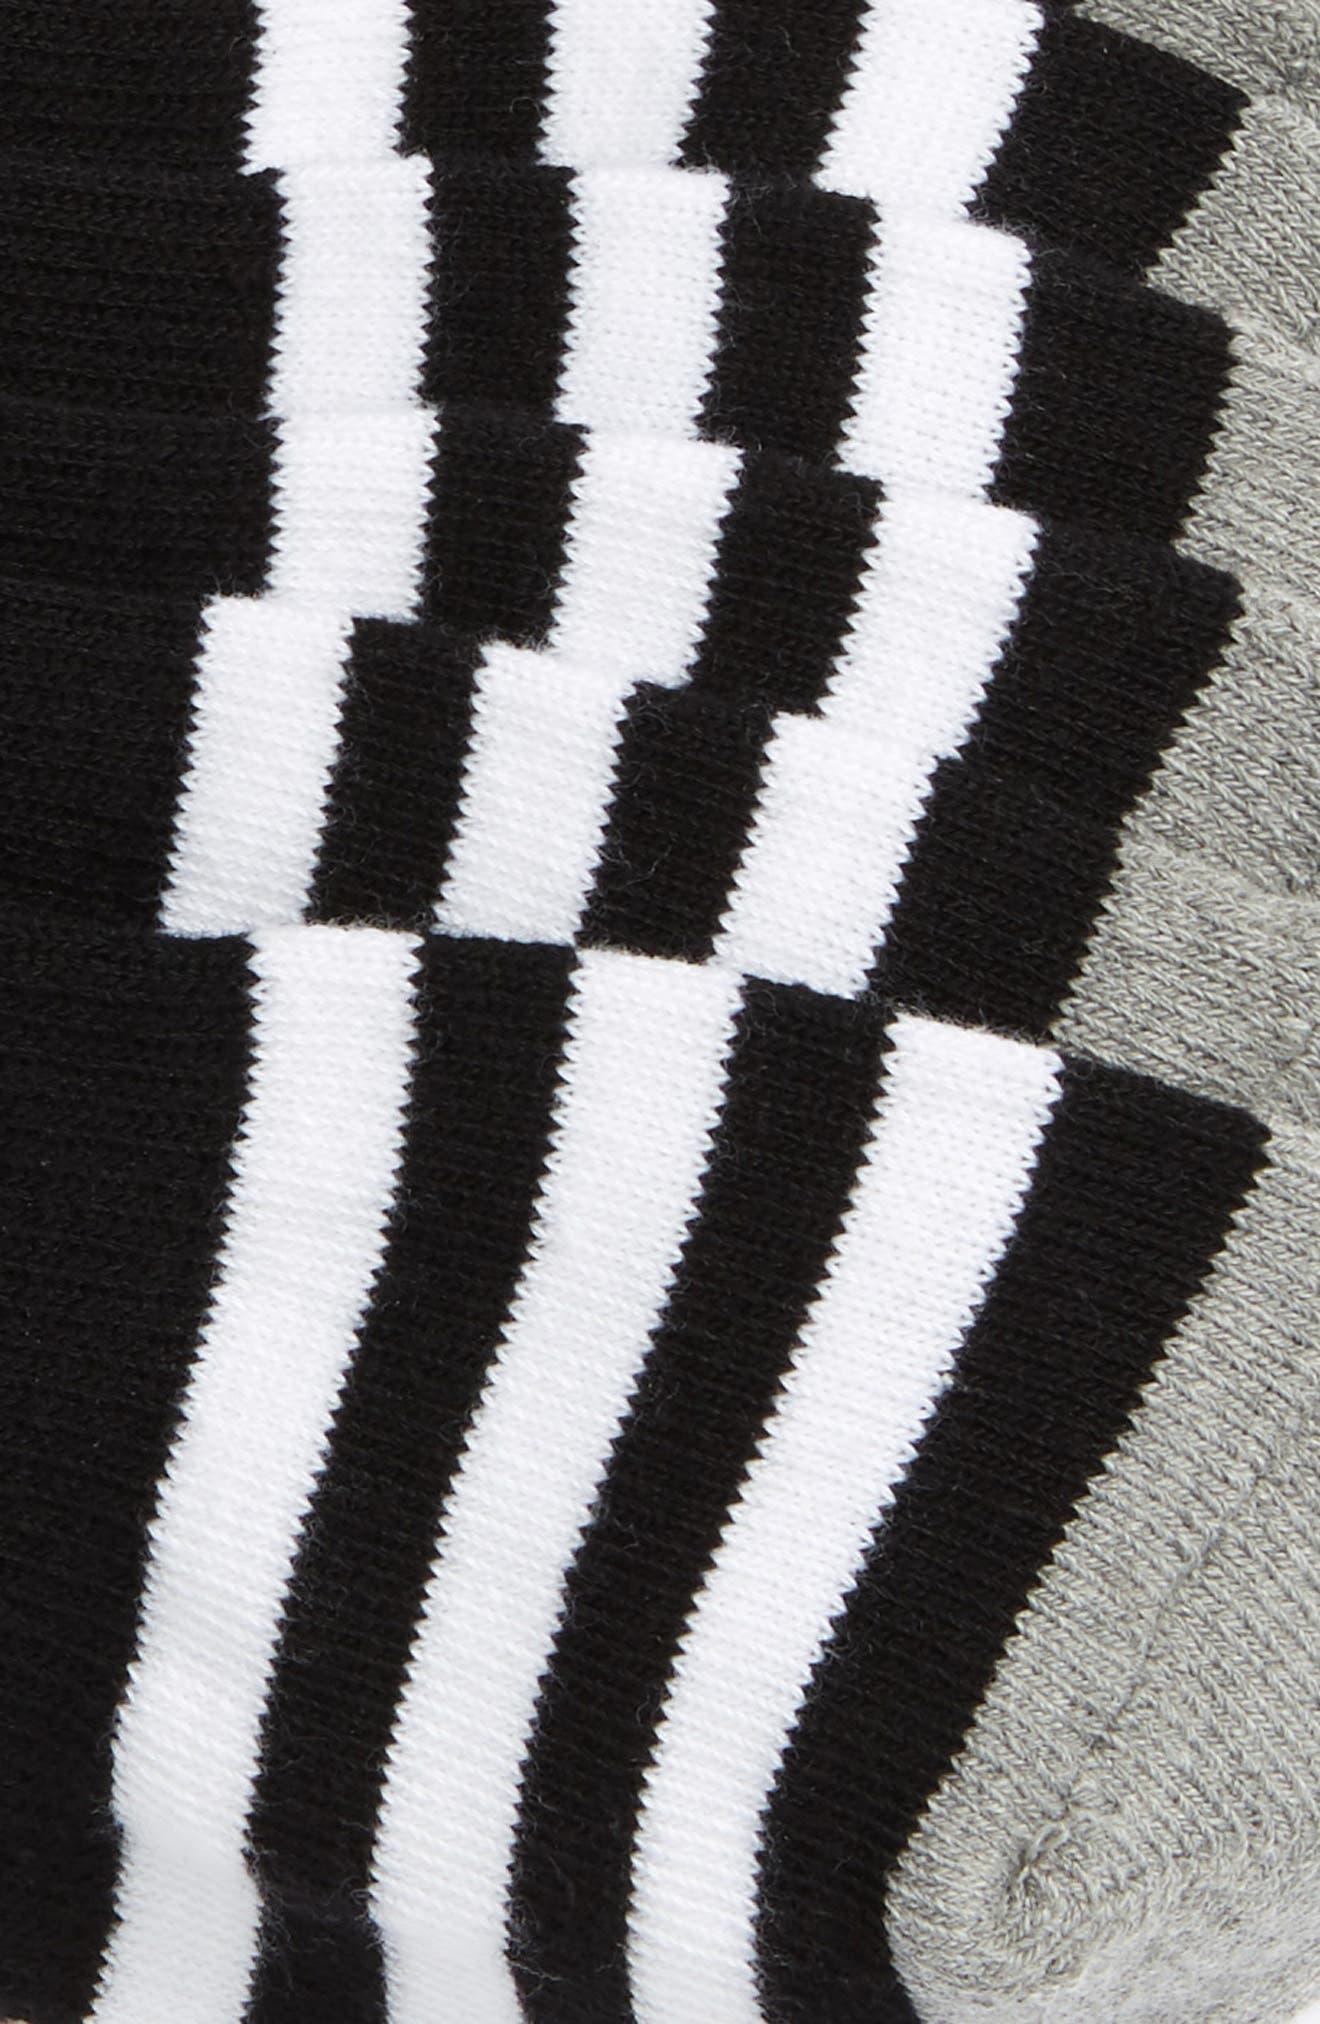 3-Pack Original Cushioned No-Show Socks,                             Alternate thumbnail 2, color,                             BLACK/ WHITE/ BLACK